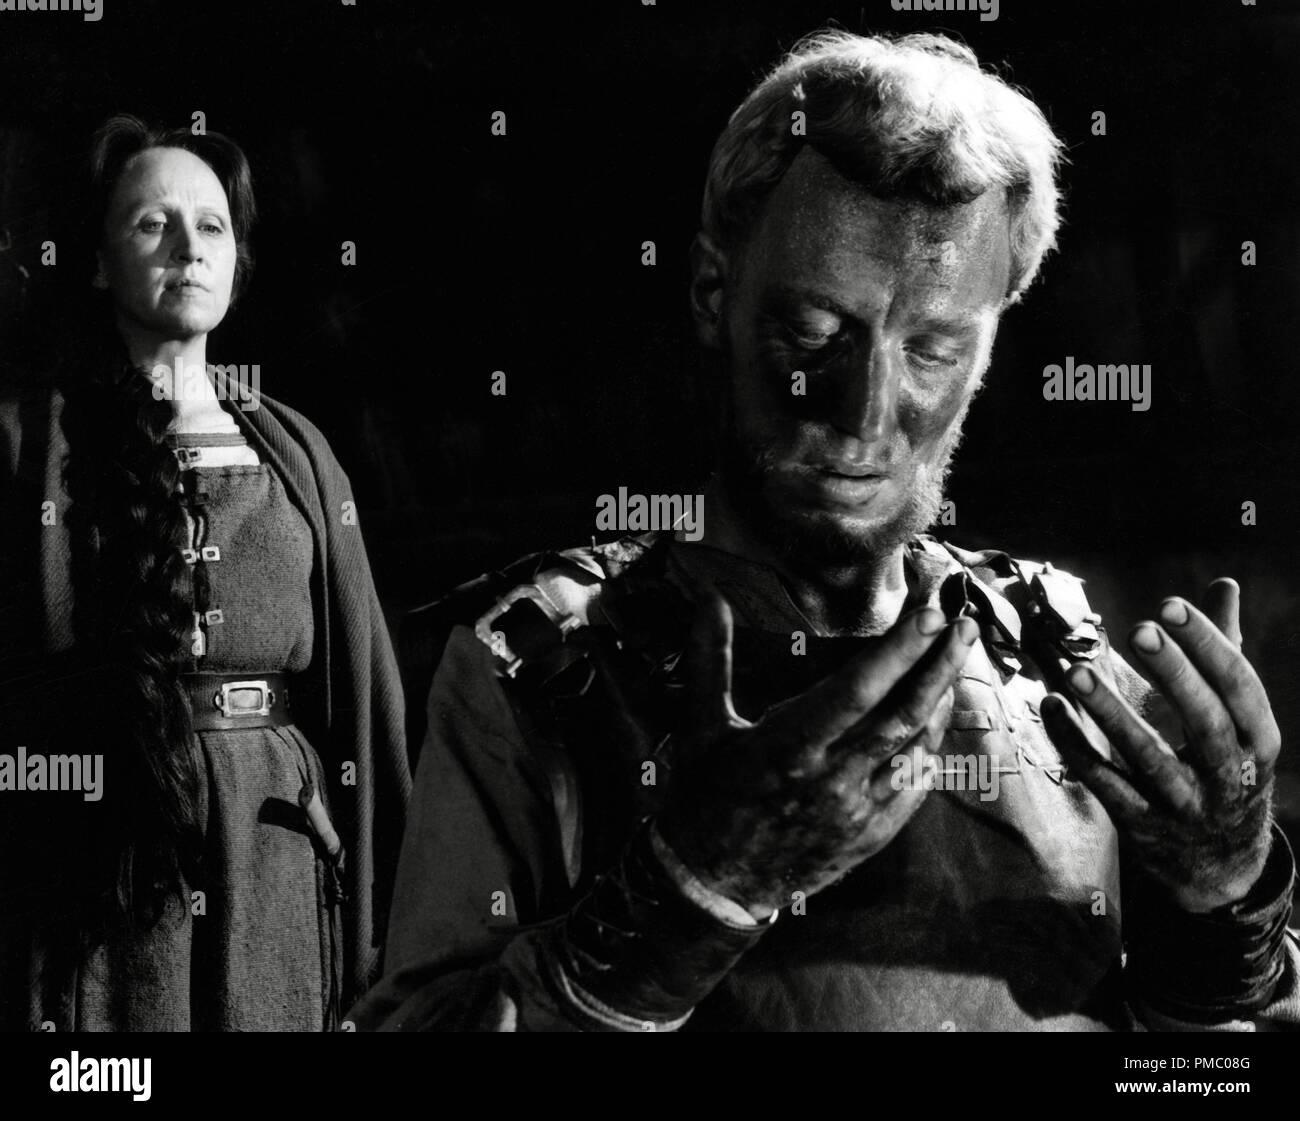 Max von Sydow, 'The Virgin Spring' aka'Jungfrukallan' Swedish, 1960 Janus Films Directed by Ingmar Bergman / File Reference # 33480_901THA - Stock Image